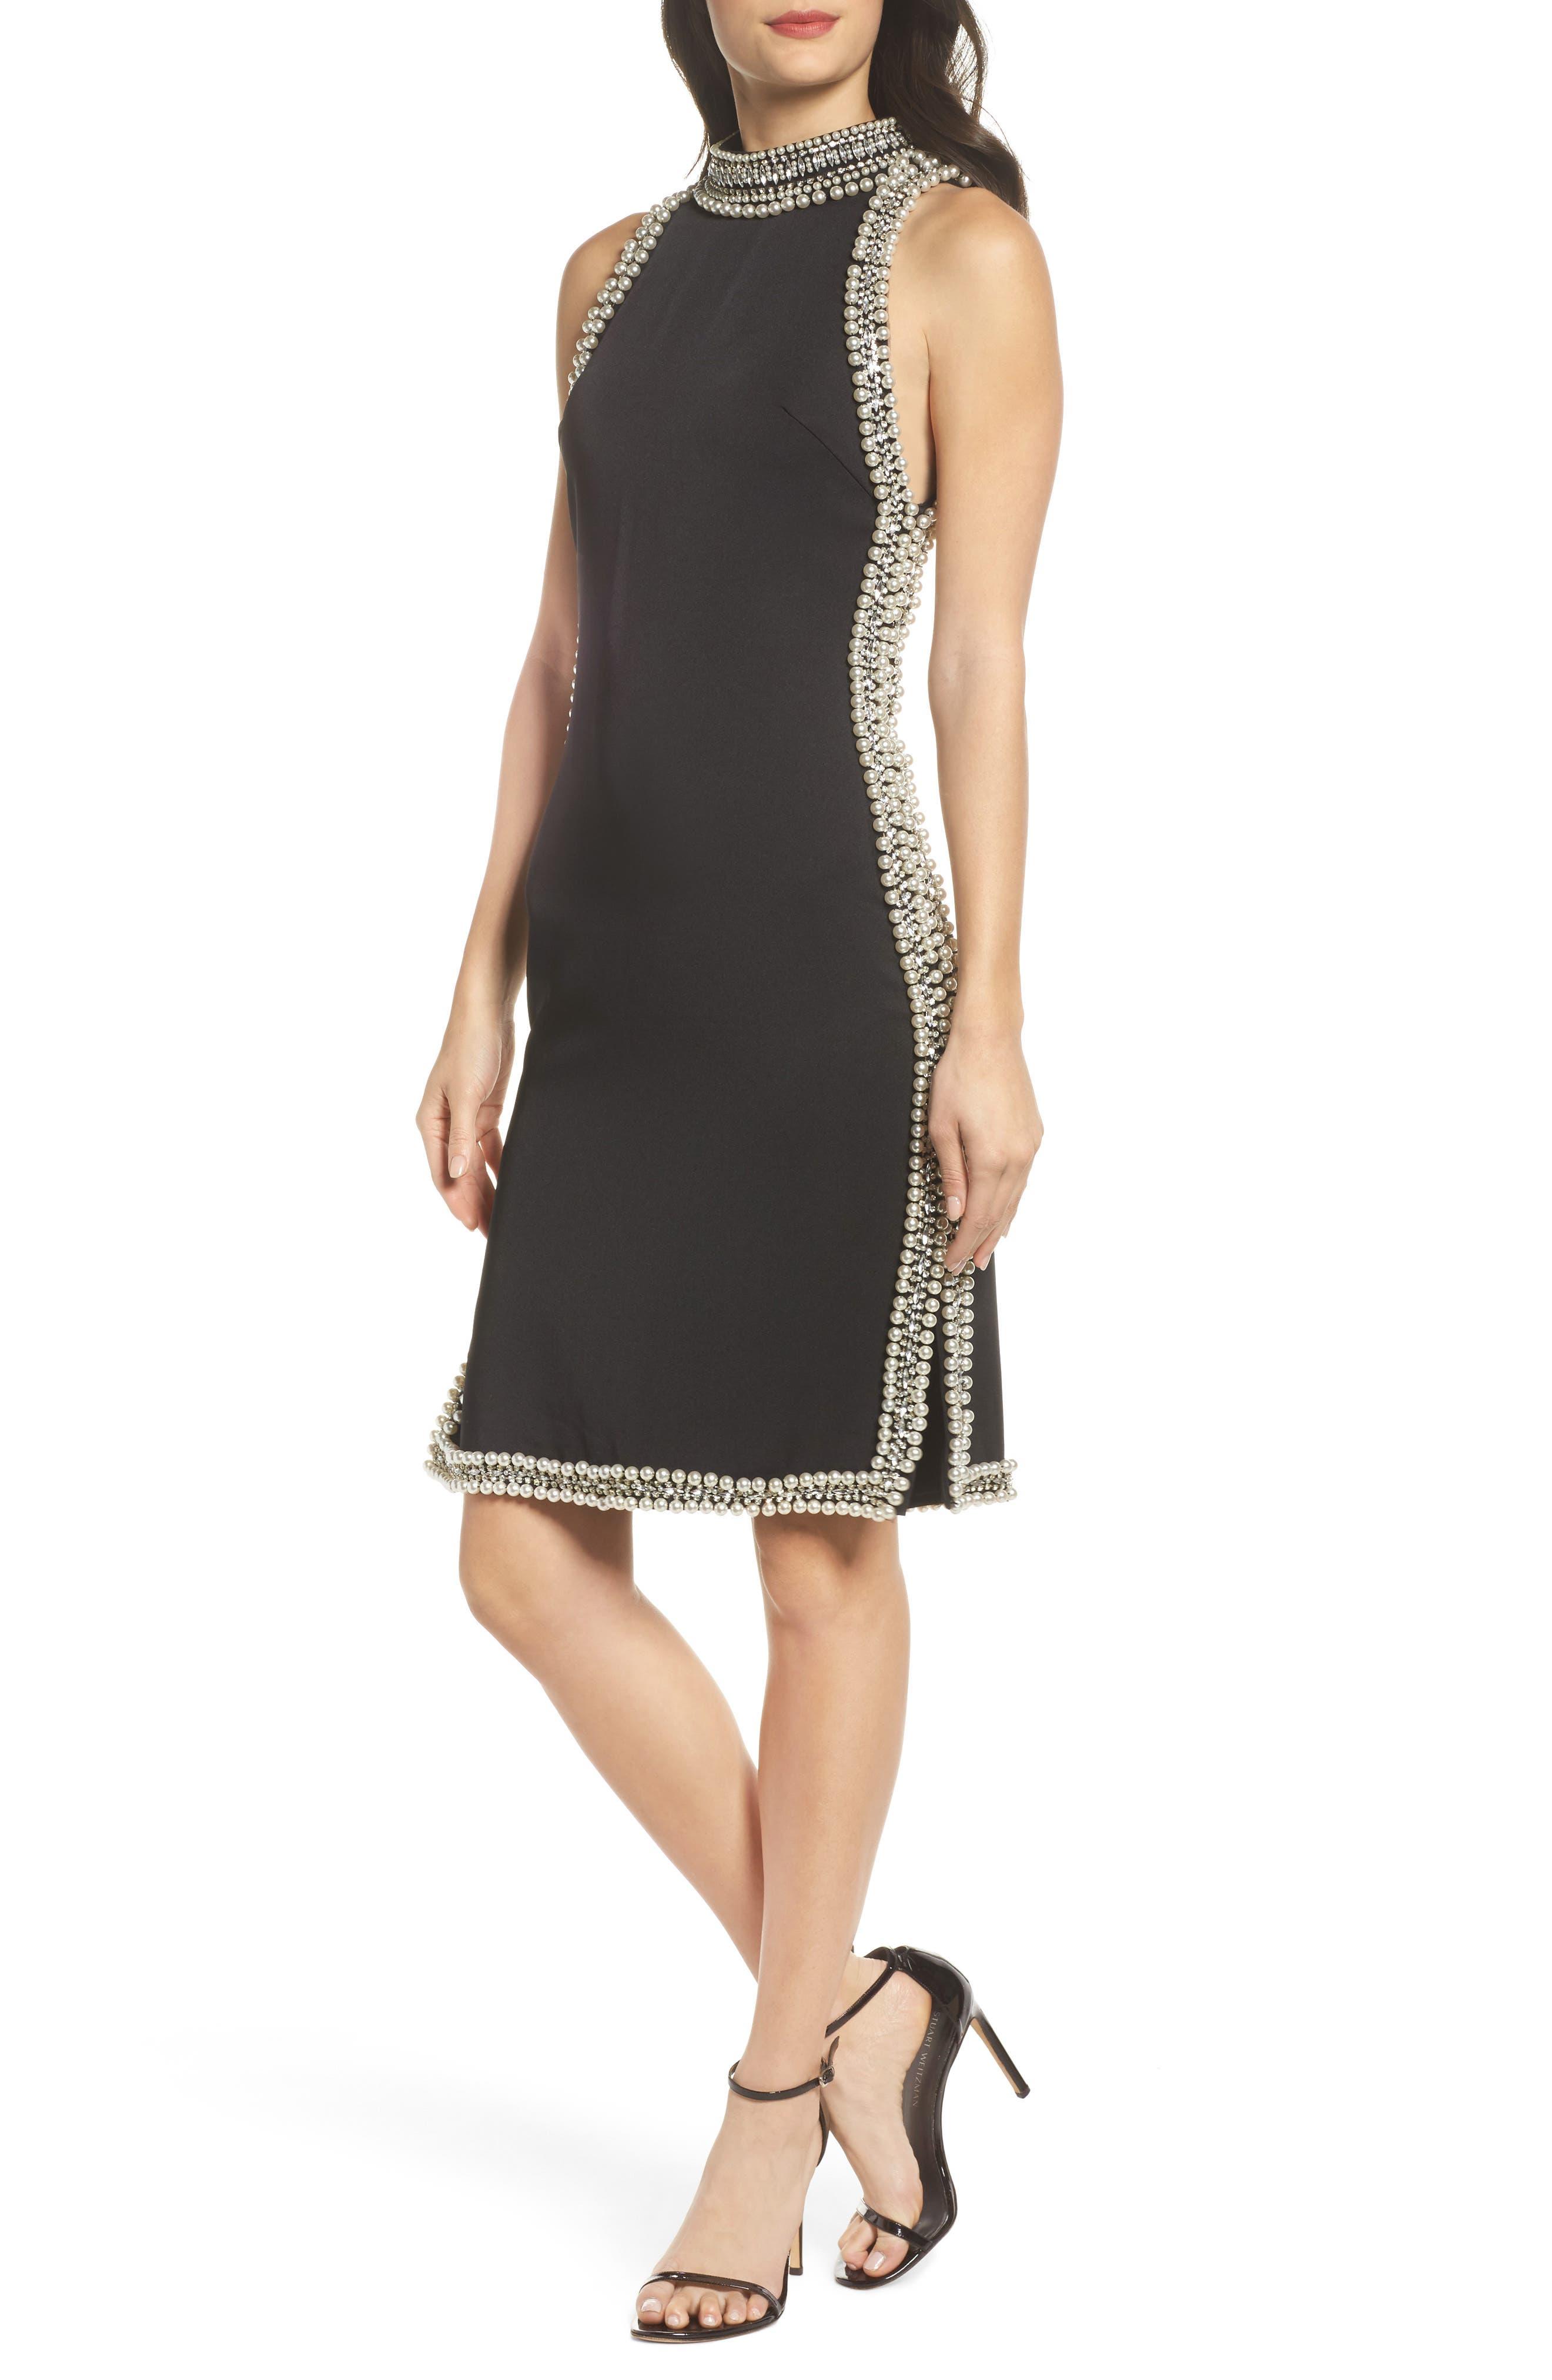 Alternate Image 1 Selected - Mac Duggal Embellished Trim Sheath Dress